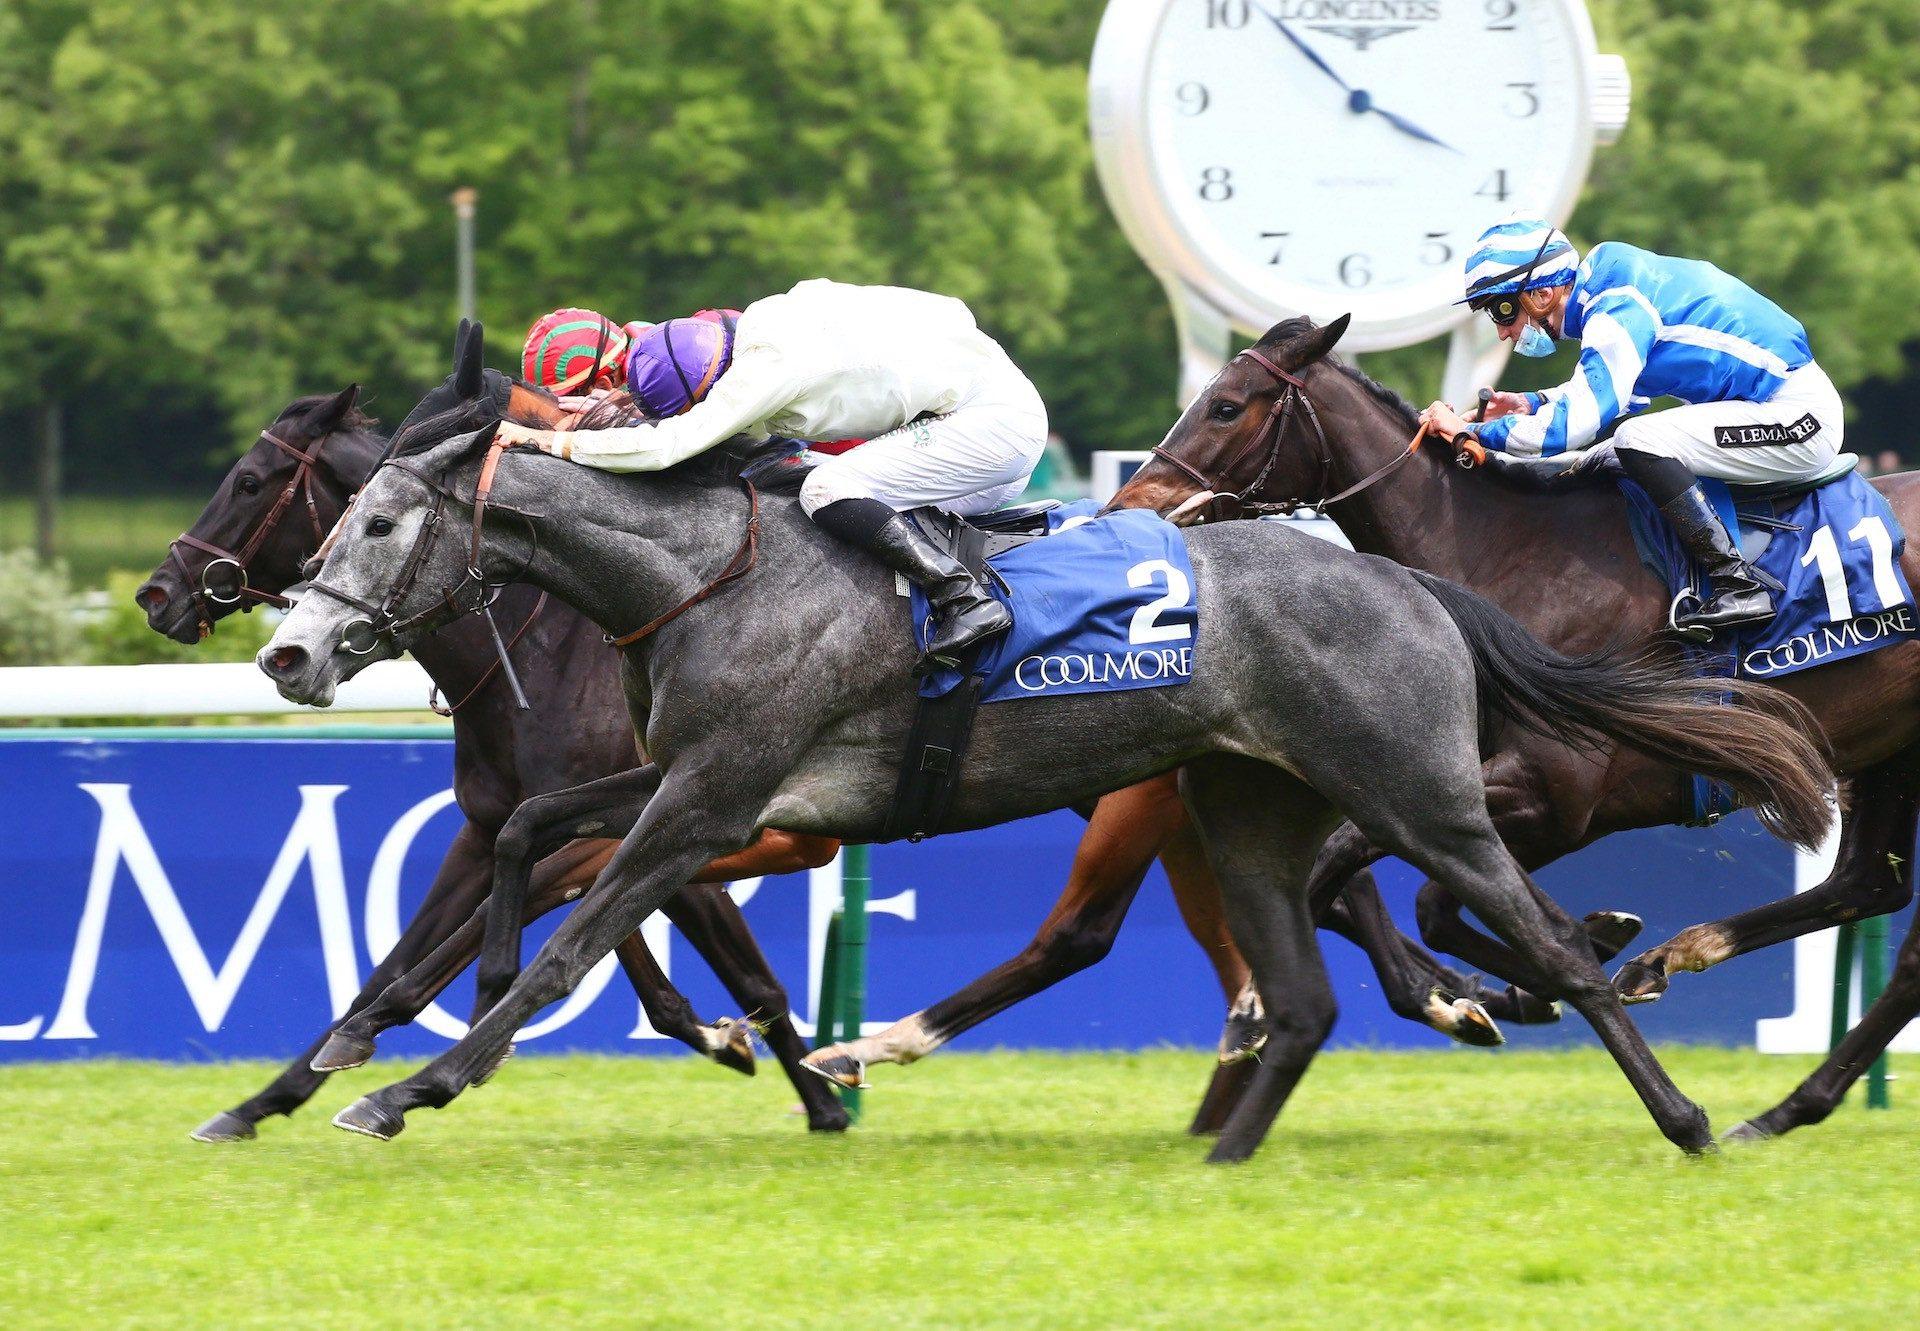 Incarville (Wootton Bassett) Wins The Group 1 Prix Saint Alary at ParisLongchamp